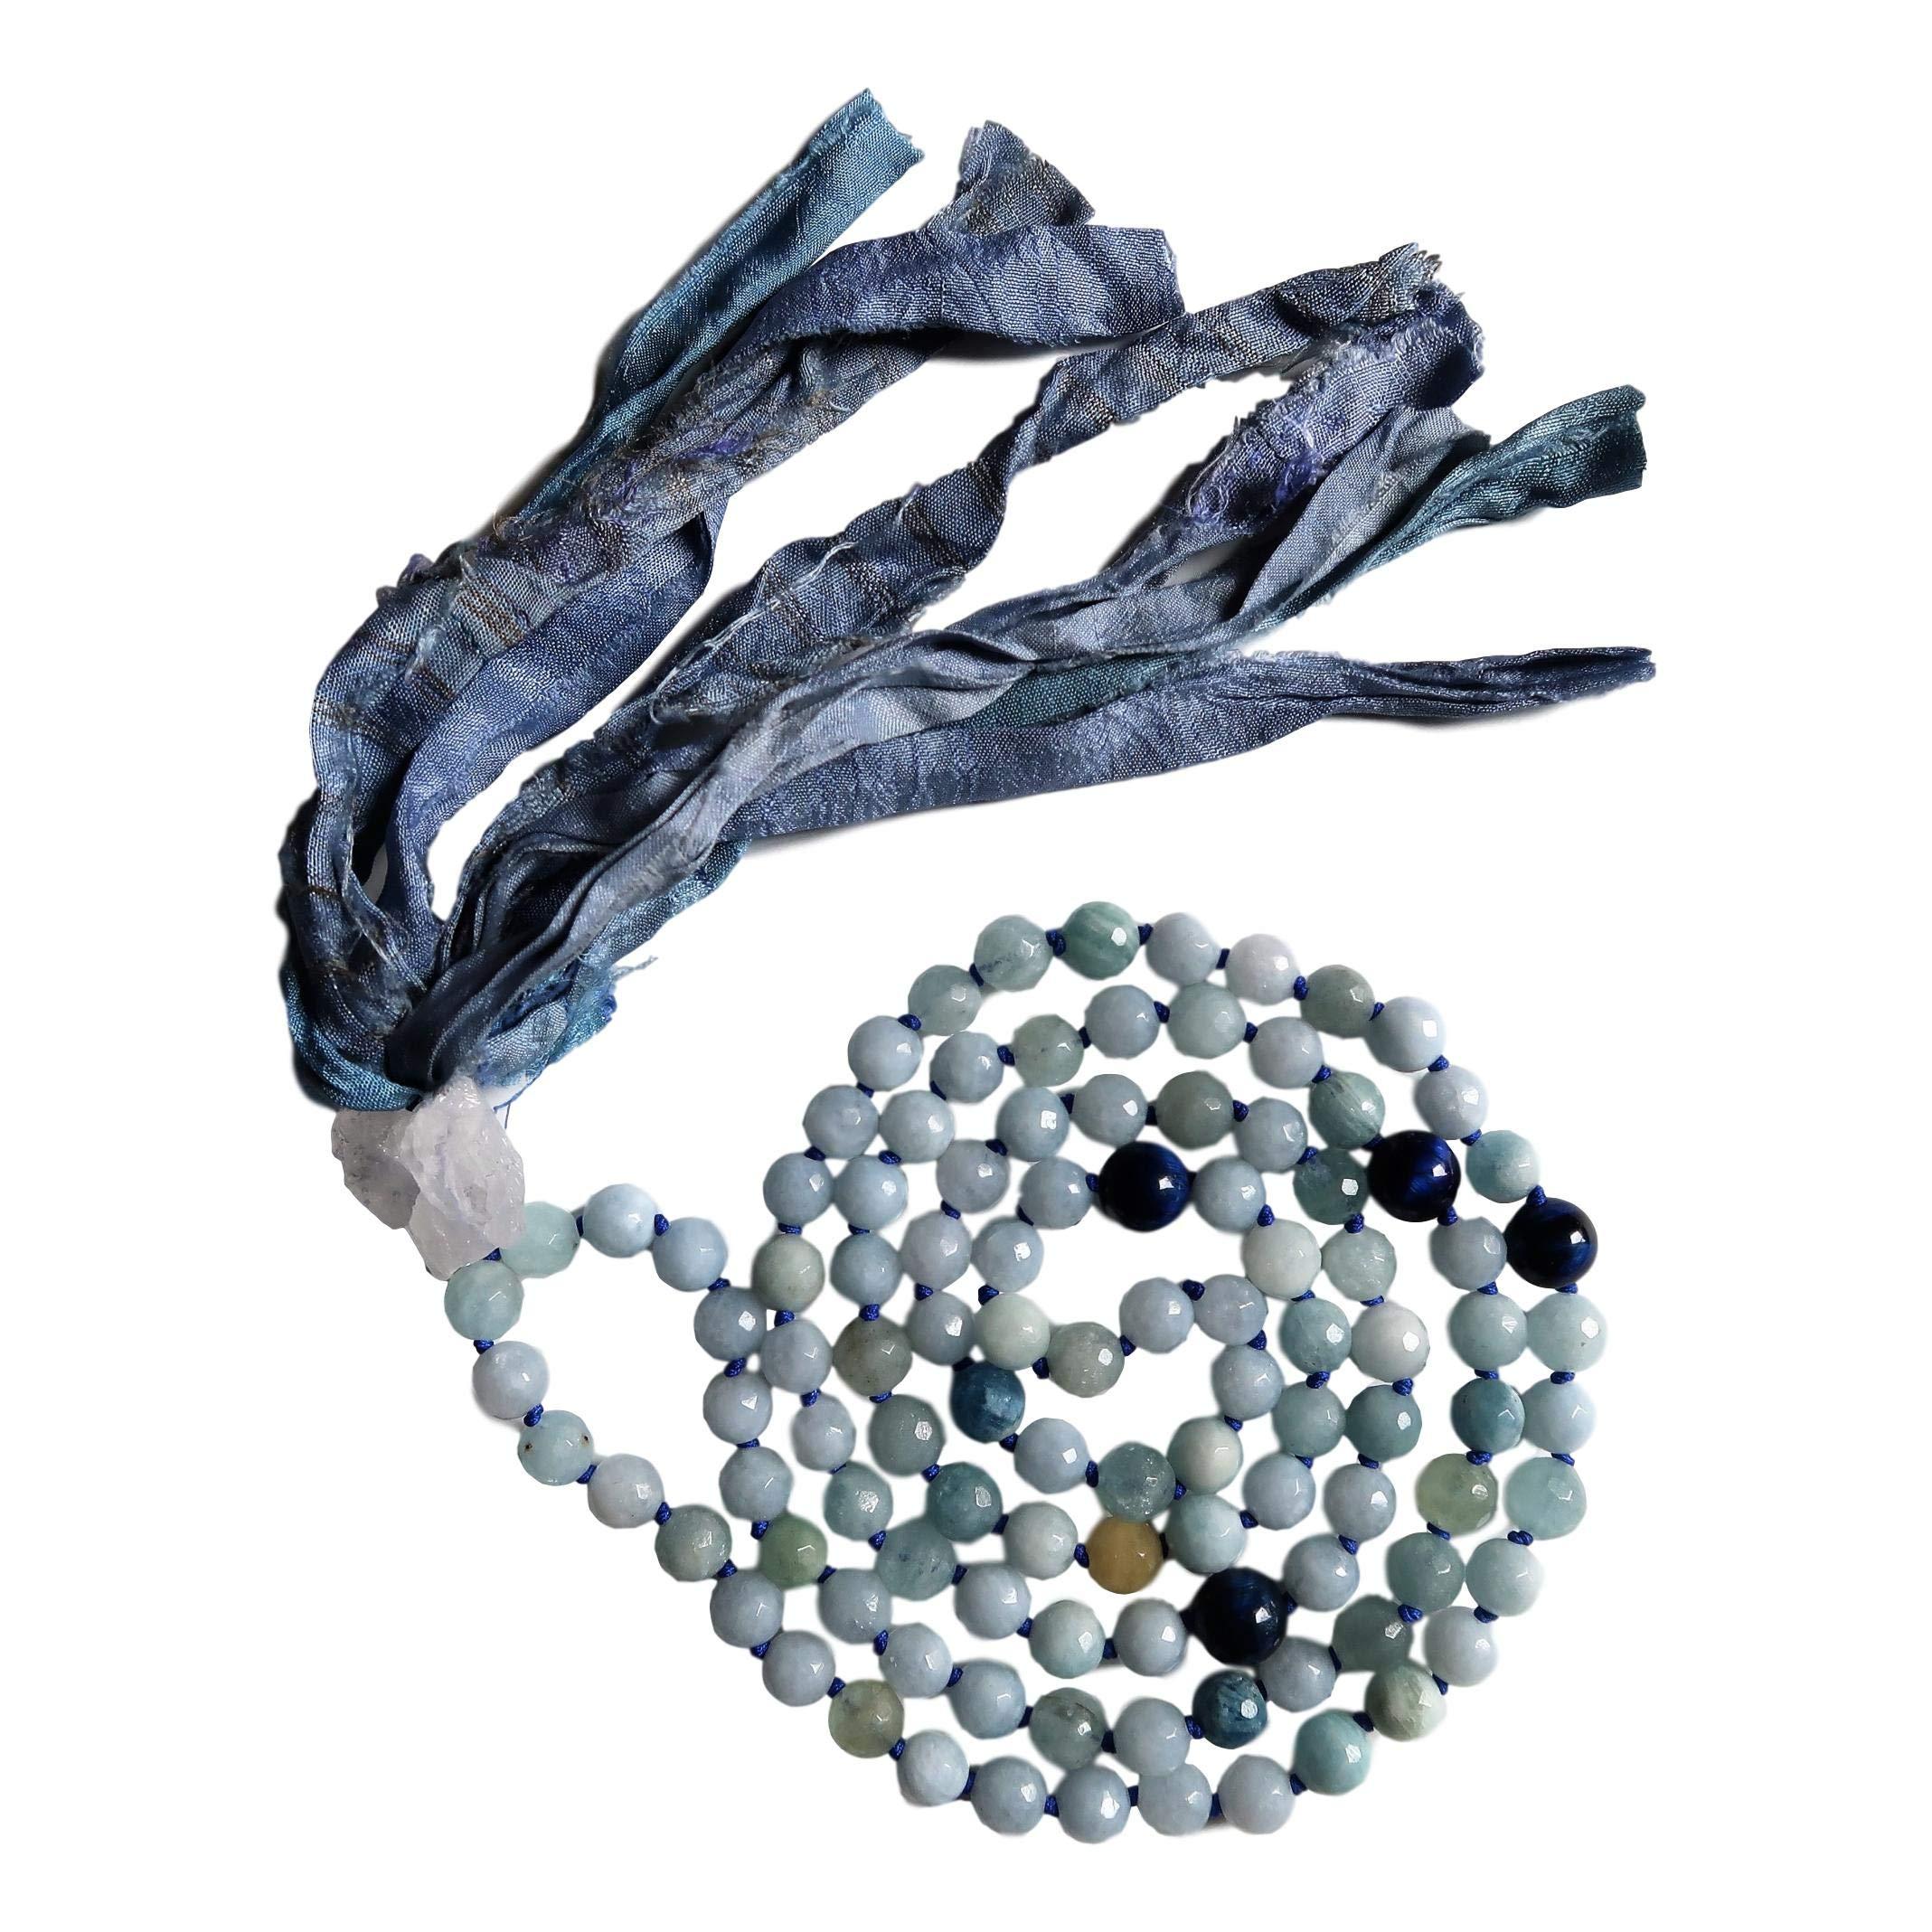 Live Radiantly 108 Mala Bead Necklace - 8mm Aquamarine Blue Tiger's Eye Stones - Clear Quartz Guru Bead - Sari Silk Tassel - Meditation, Mindfulness, Yoga - Mala to Foster Calm, Protection and Peace